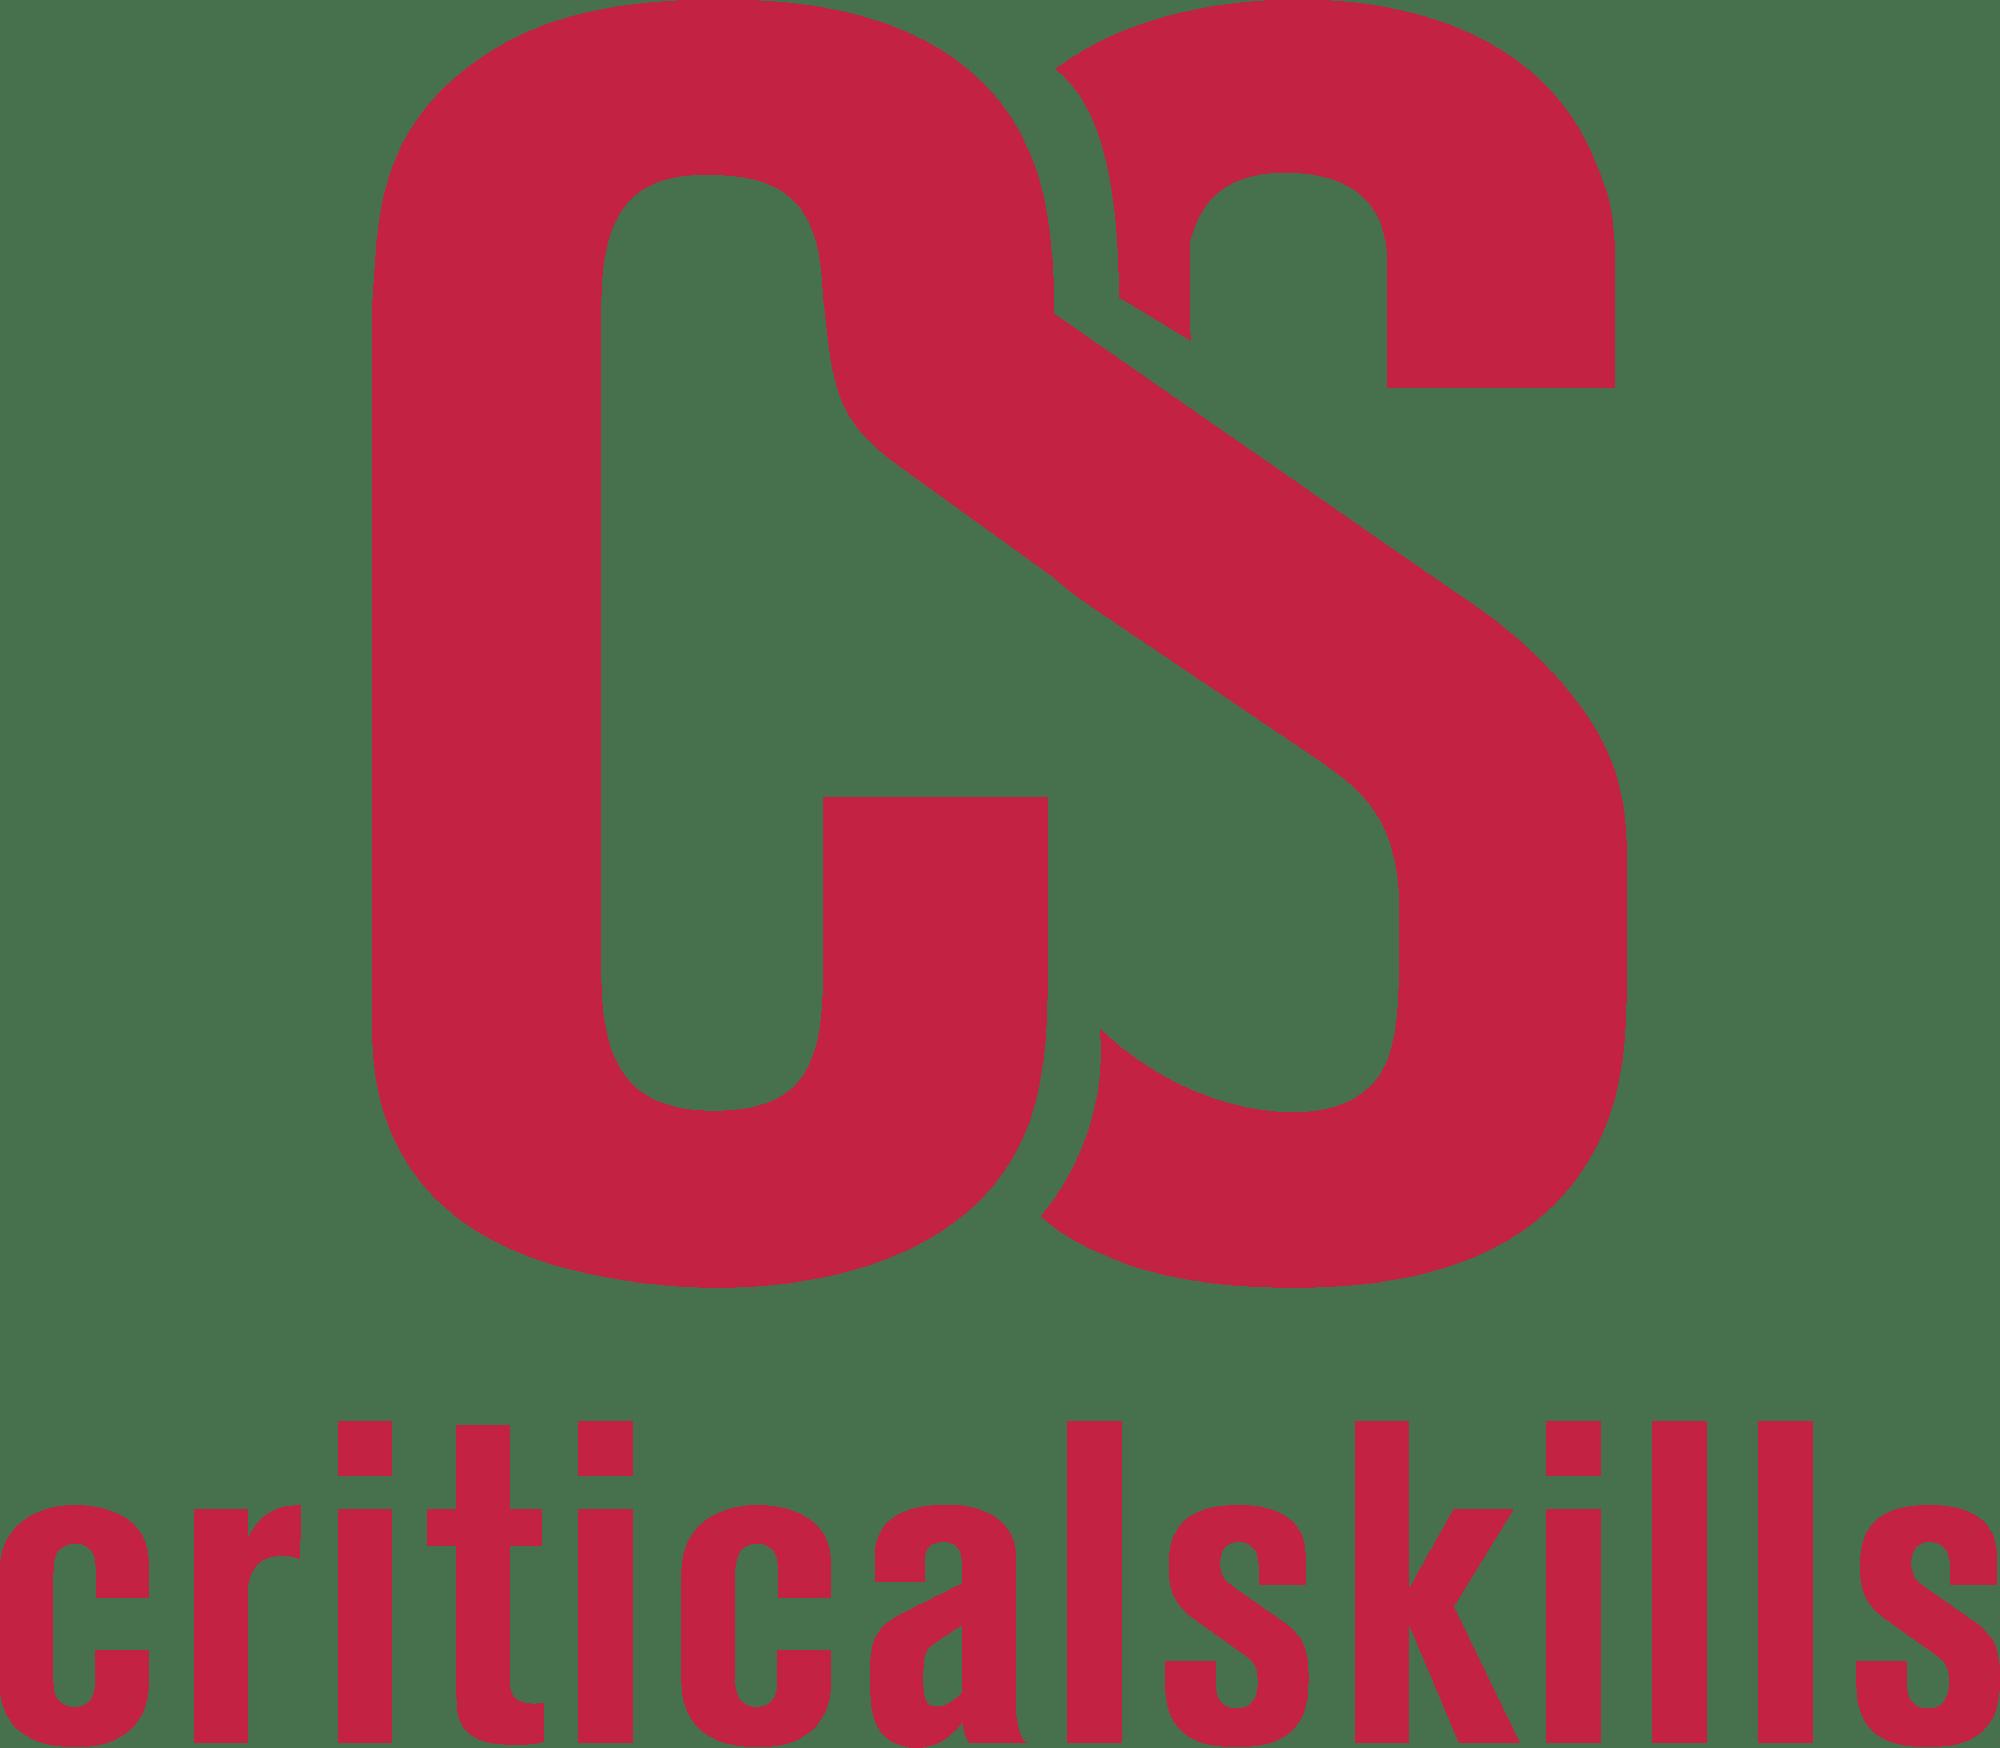 Critical Skills Irlanda | Critical Skills Ireland